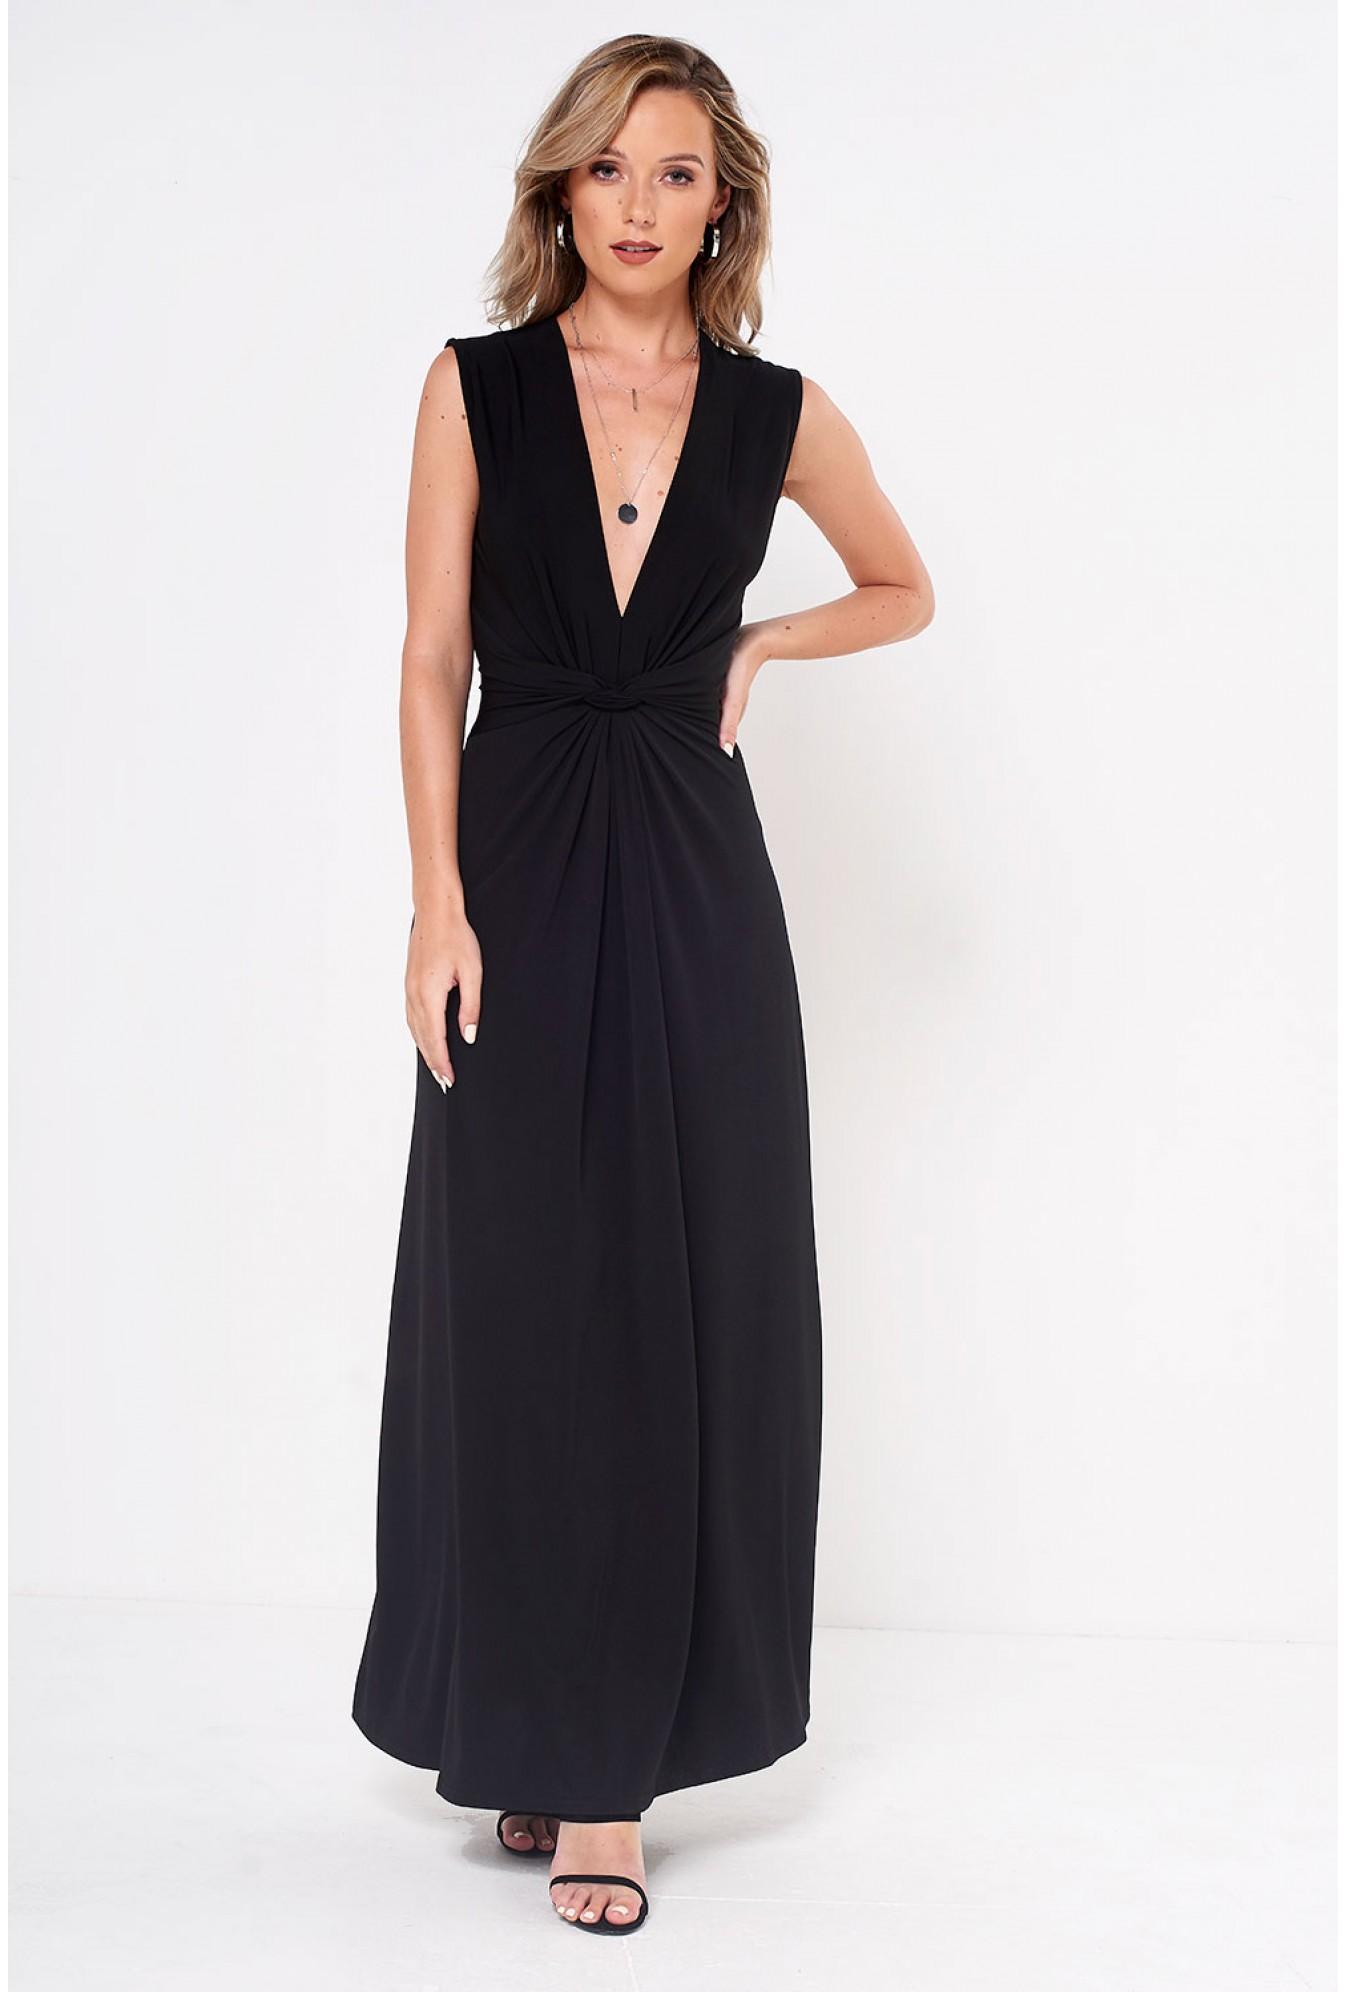 486051bc44 More Views. Poppy Knot Waist Maxi Dress in Black